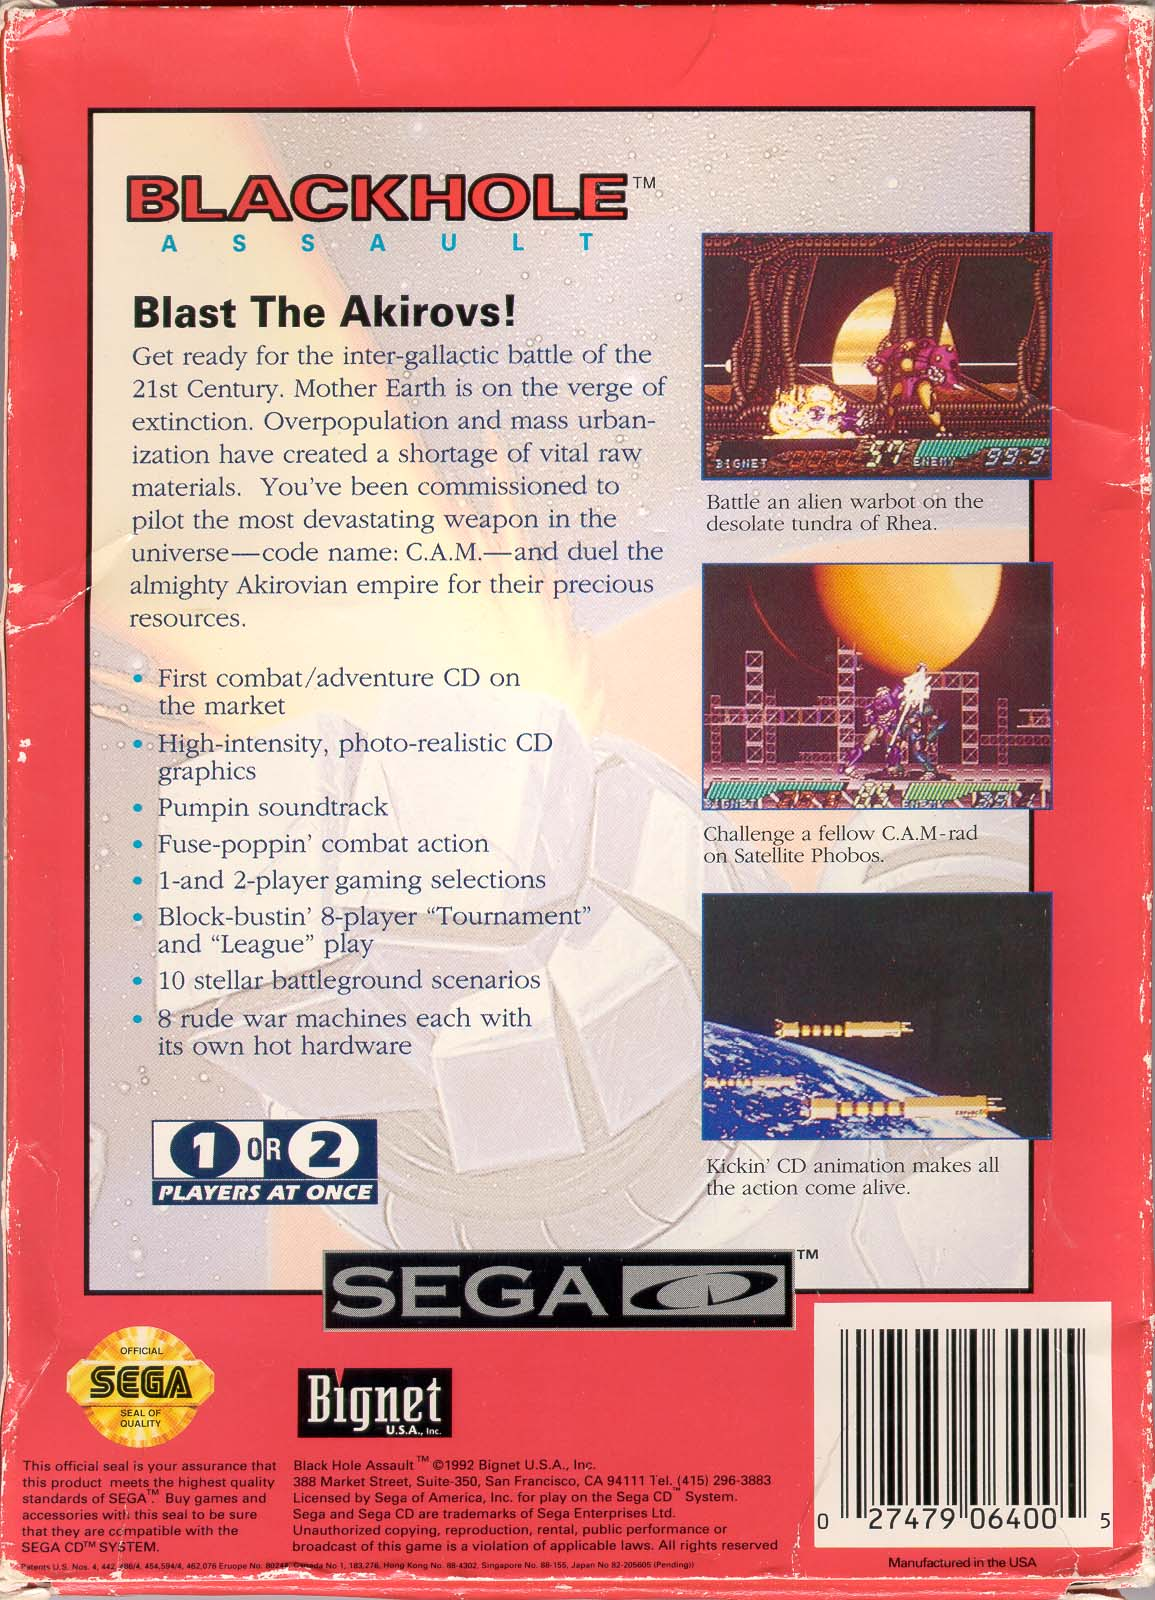 sega mega cd box scans b game covers box scans box art cd labels blackhole assault u back jpg